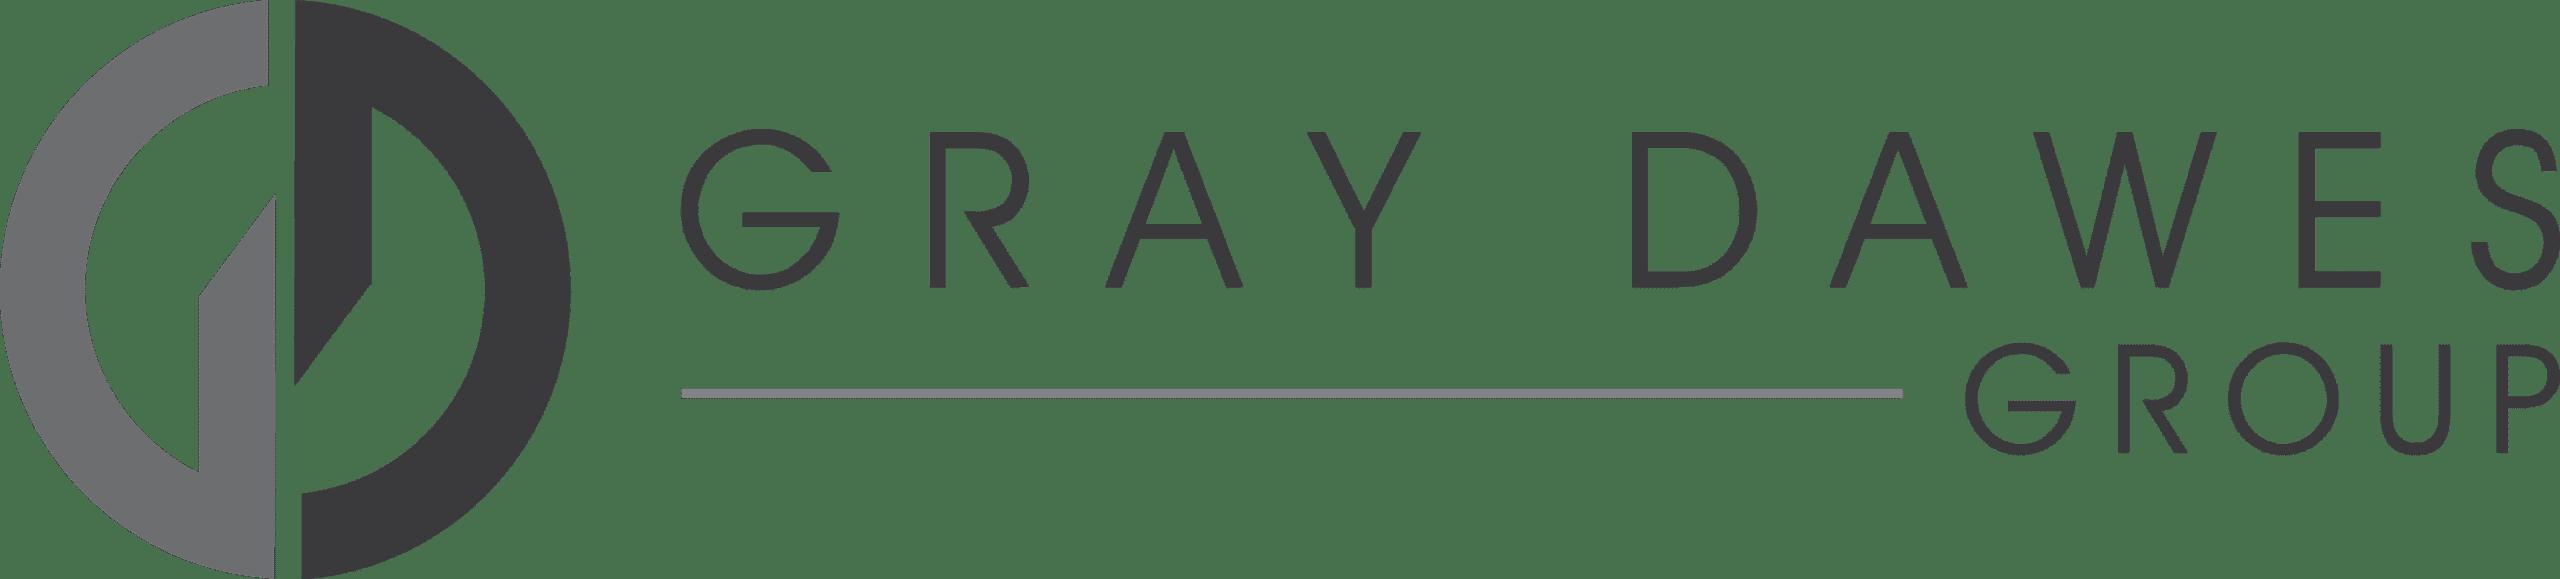 Gray Dawes Group Alternative Logo